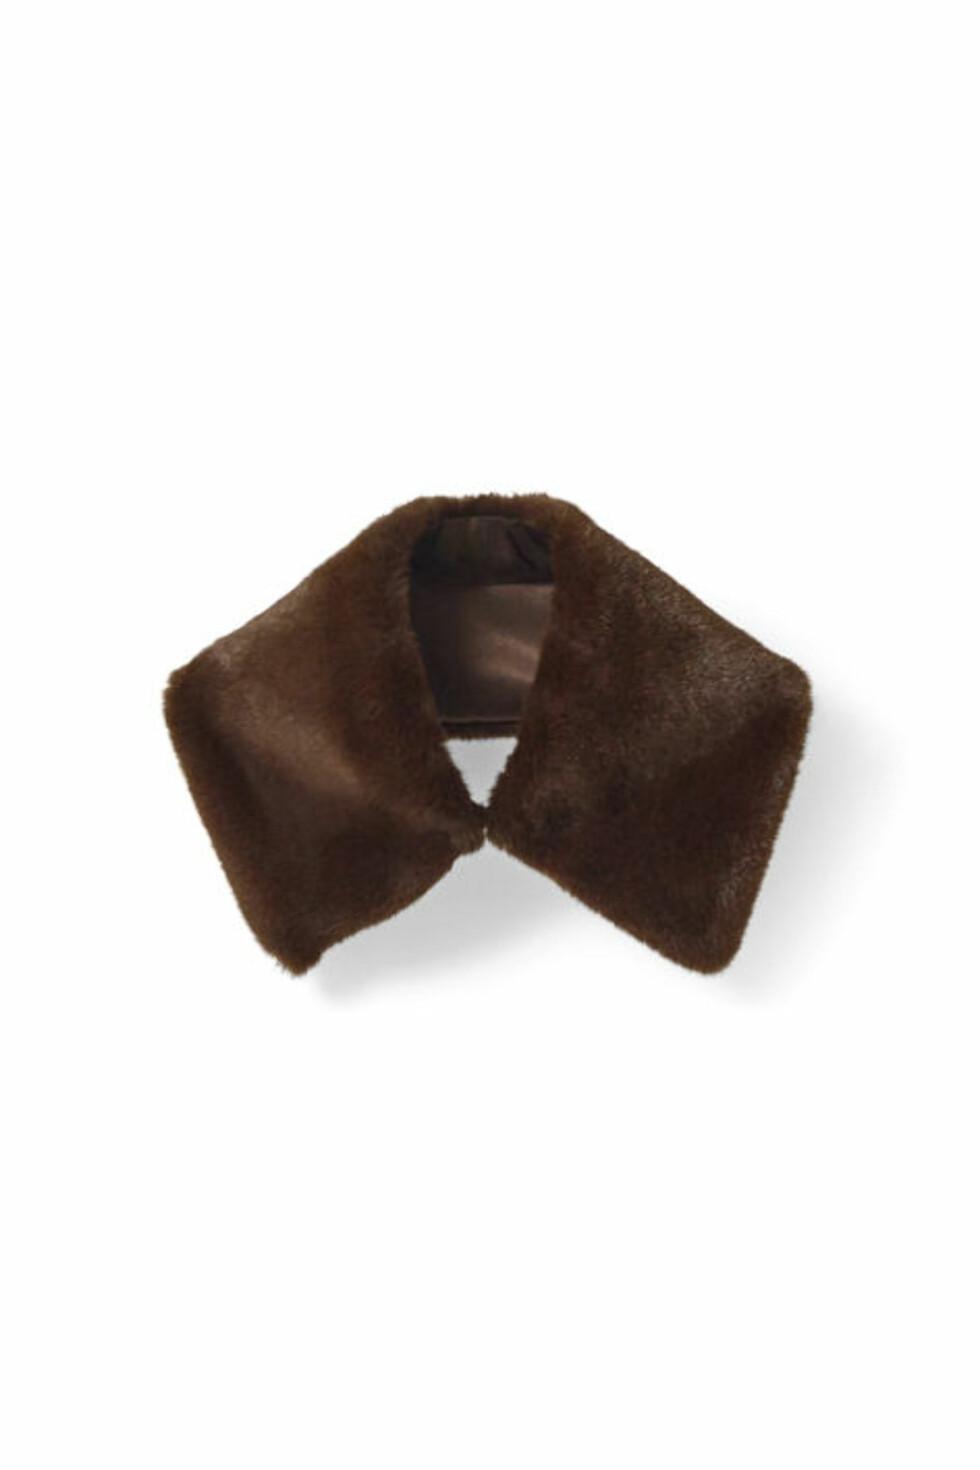 Krage fra Ganni | kr. 549 | http://www.ganni.com/shop/accessories/fenn-fur-collar/A0993.html?dwvar_A0993_color=Potting%20Soil#start=2